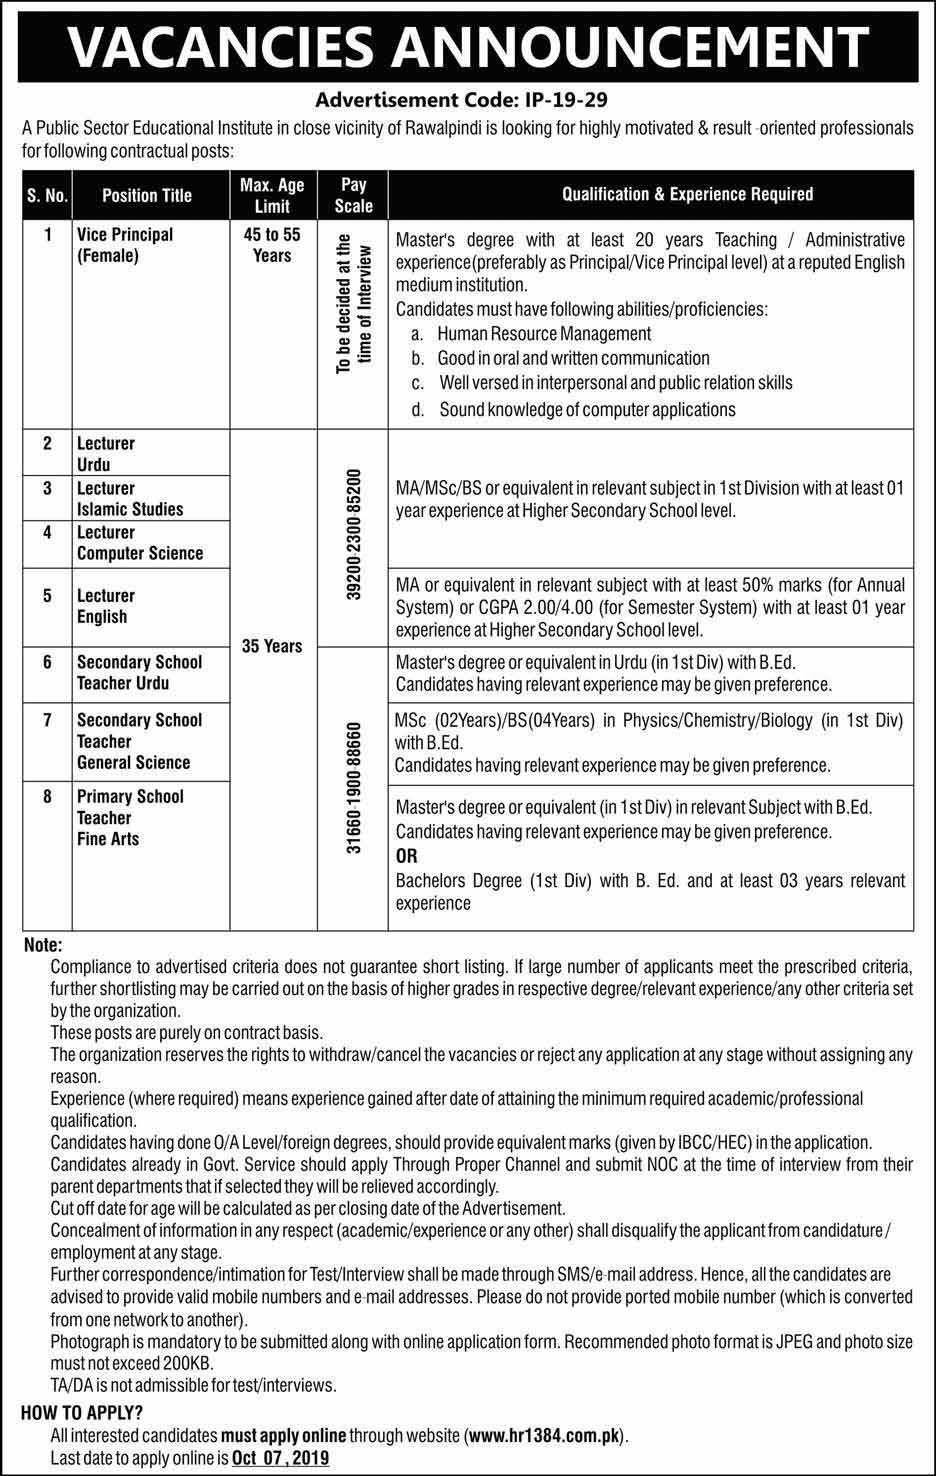 Jobs in Rawalpindi in Public Sector Educational Institute